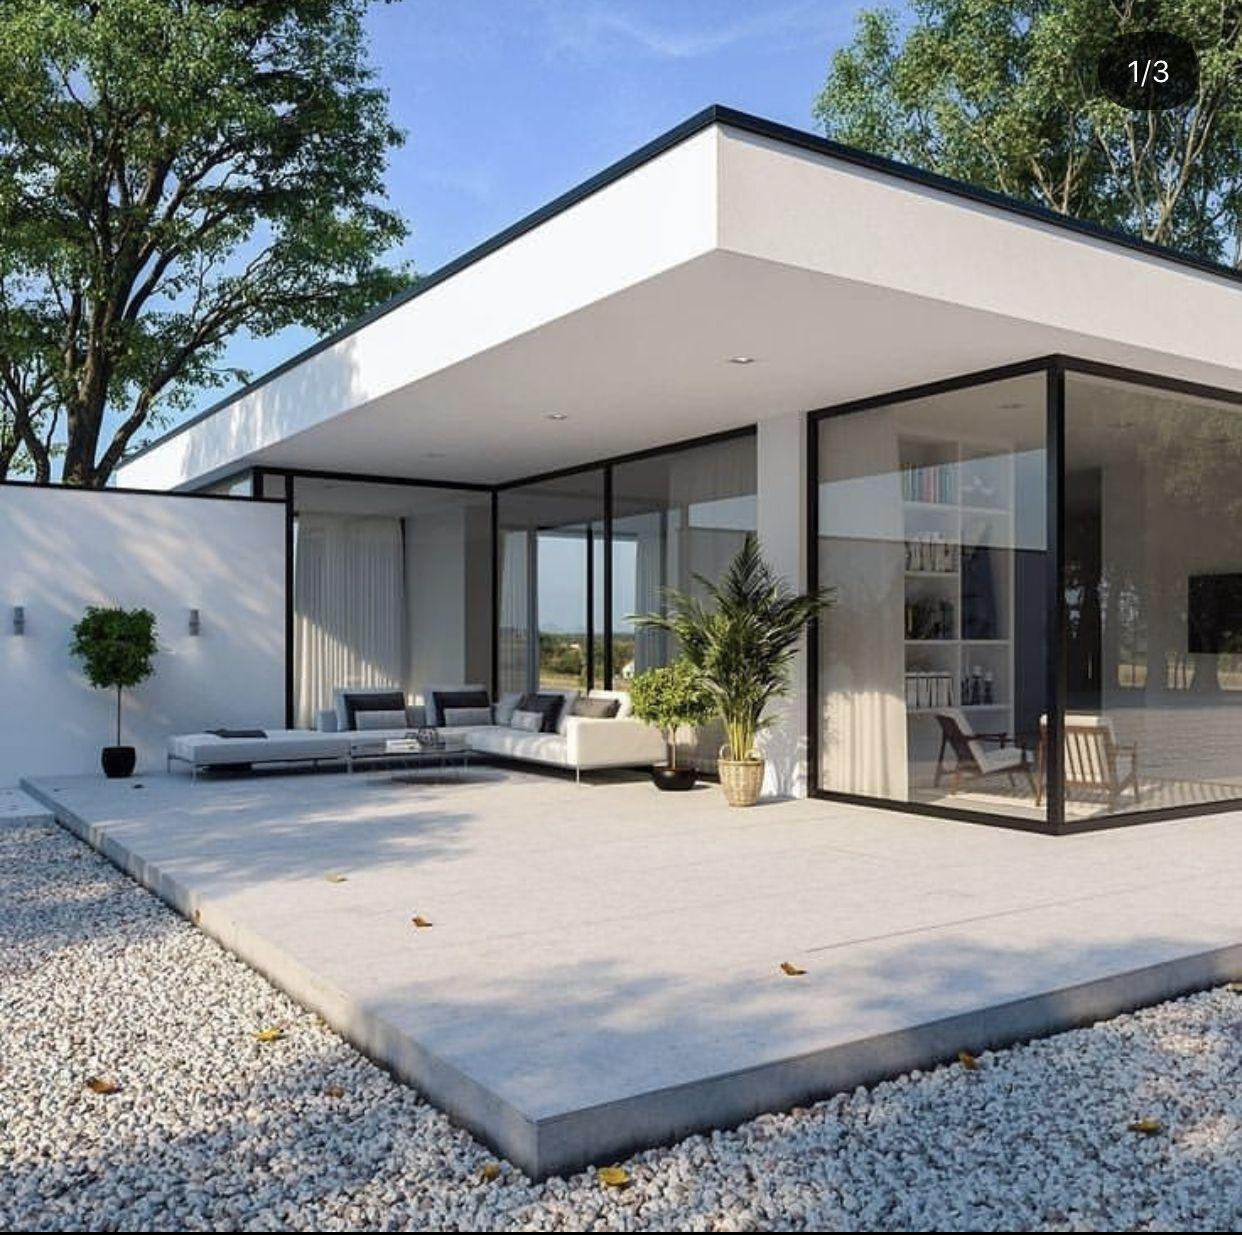 Pin Von Alondra Sevsants Auf Plants Balcon Terrace In 2020 Haus Design Haus Malen Haus